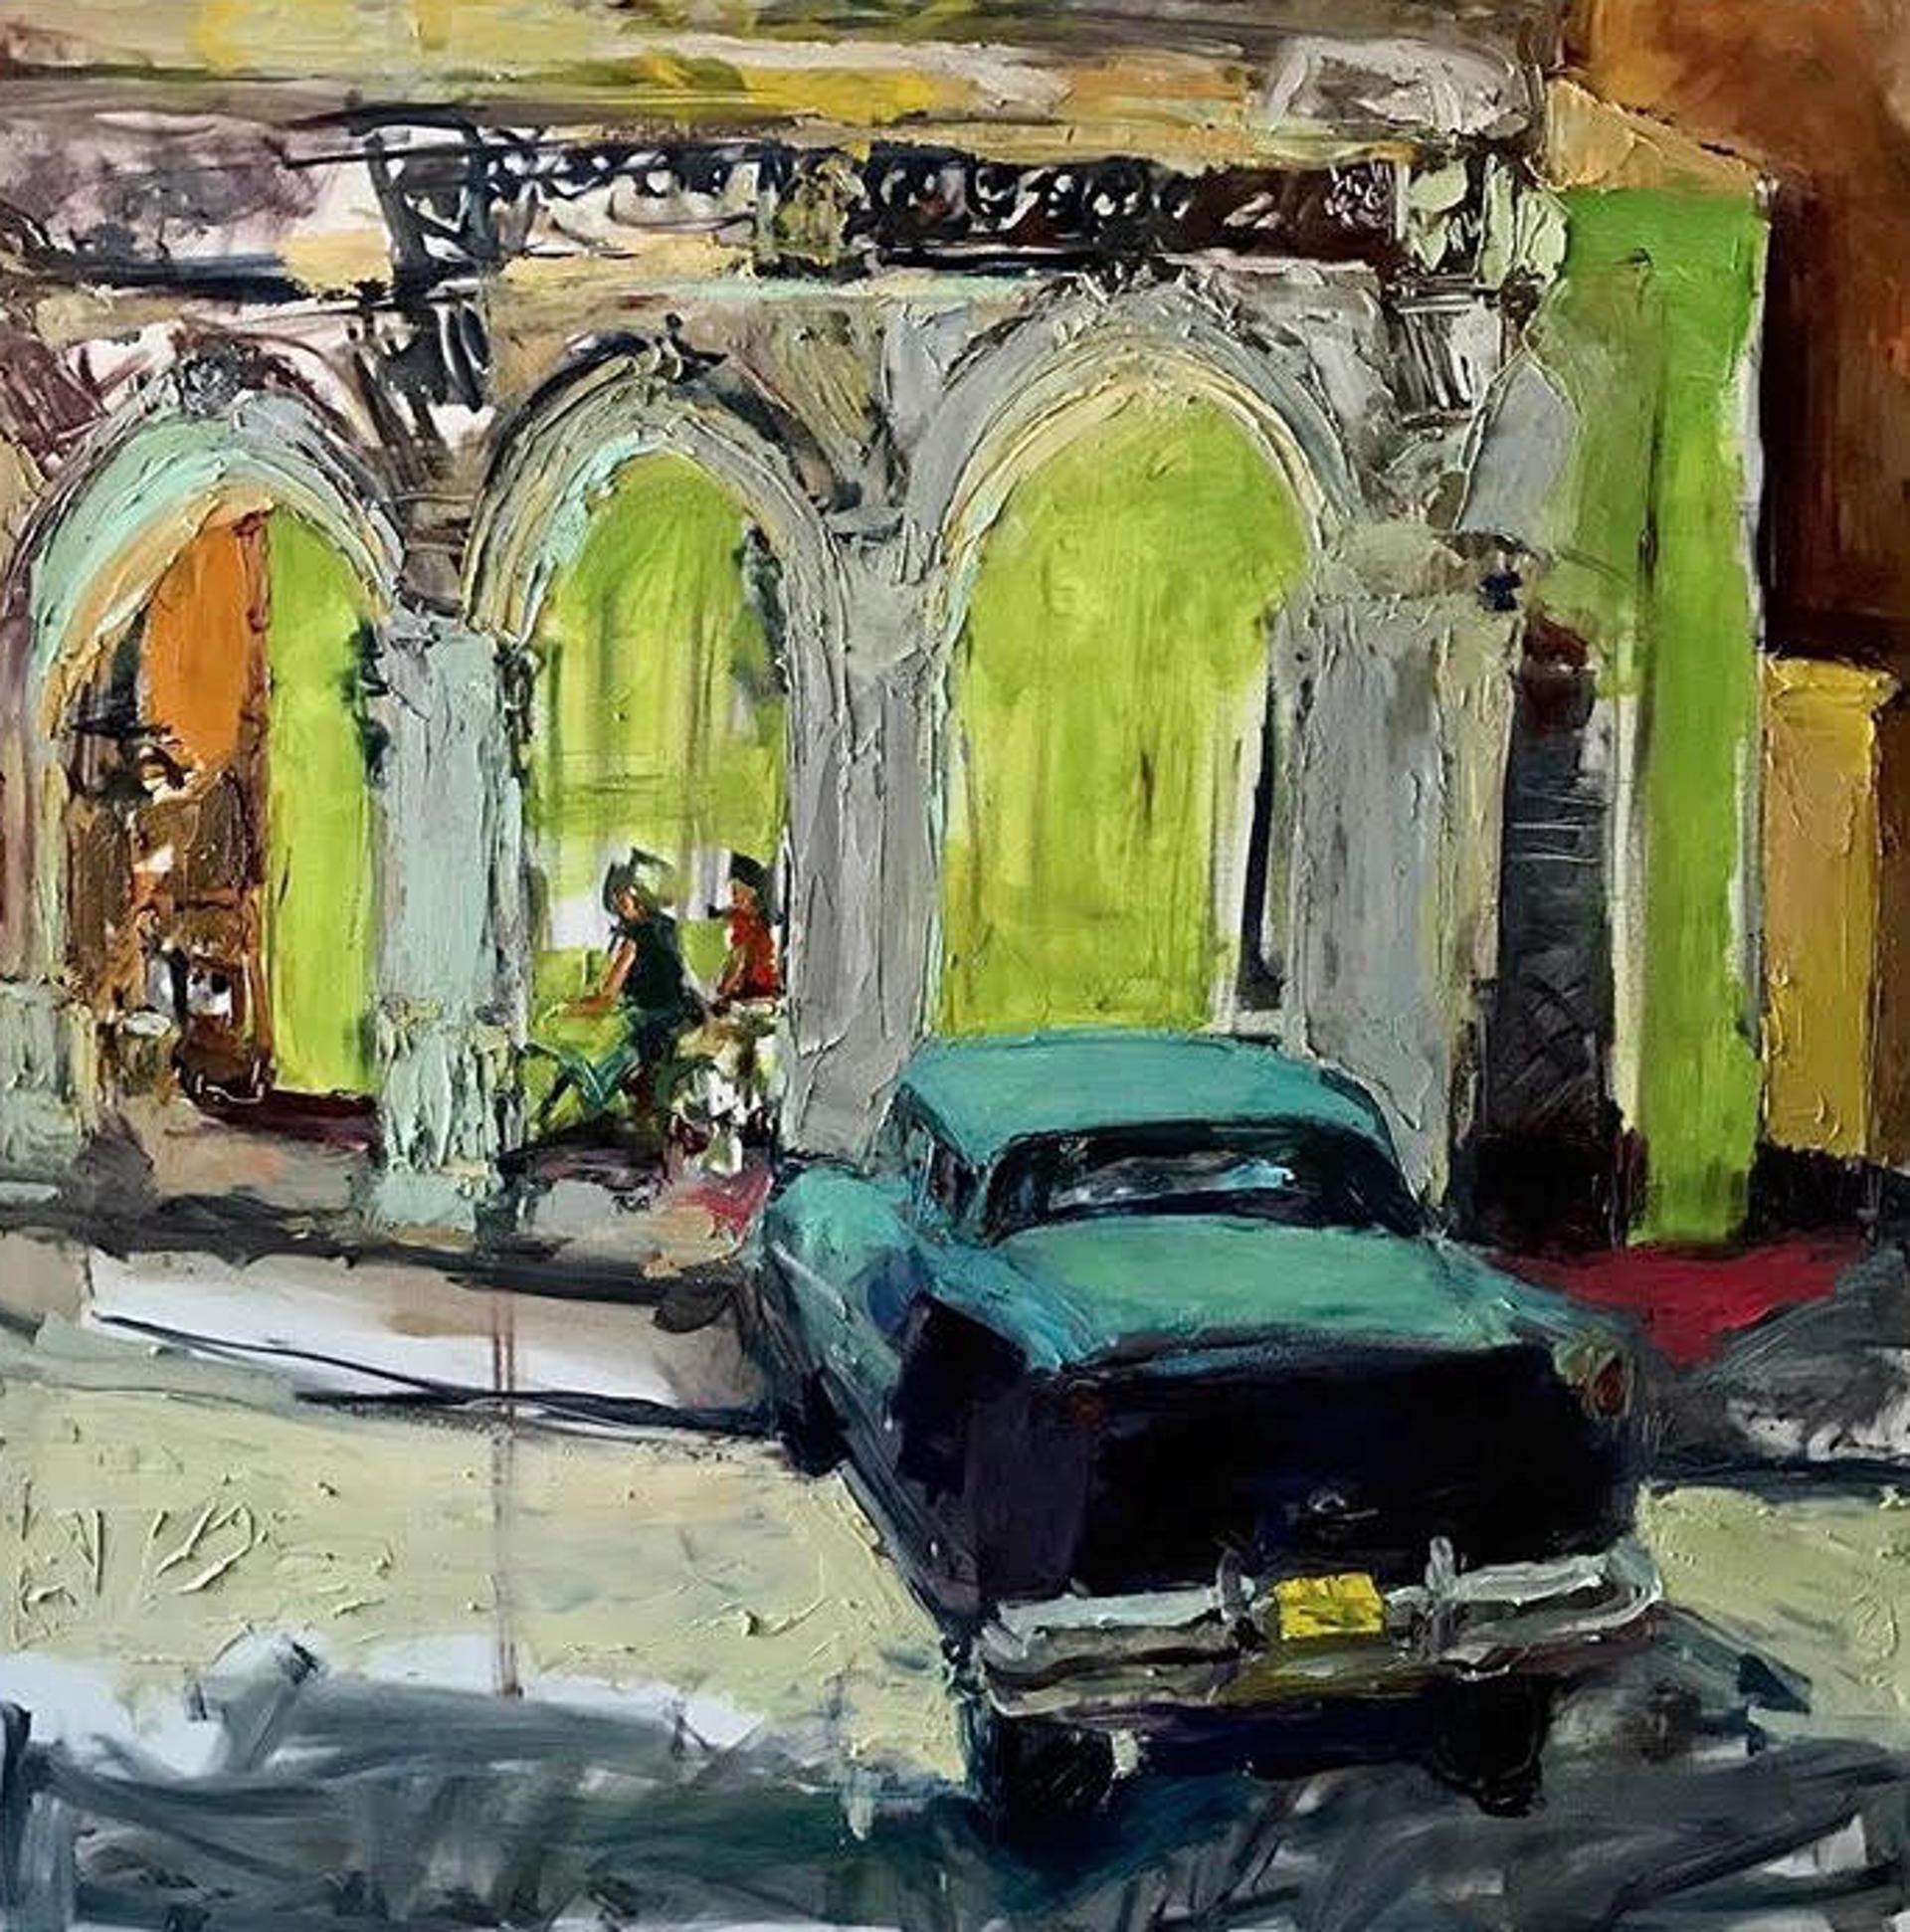 La Vida Cuba - Car on Green Street Corner by Ana Guzman